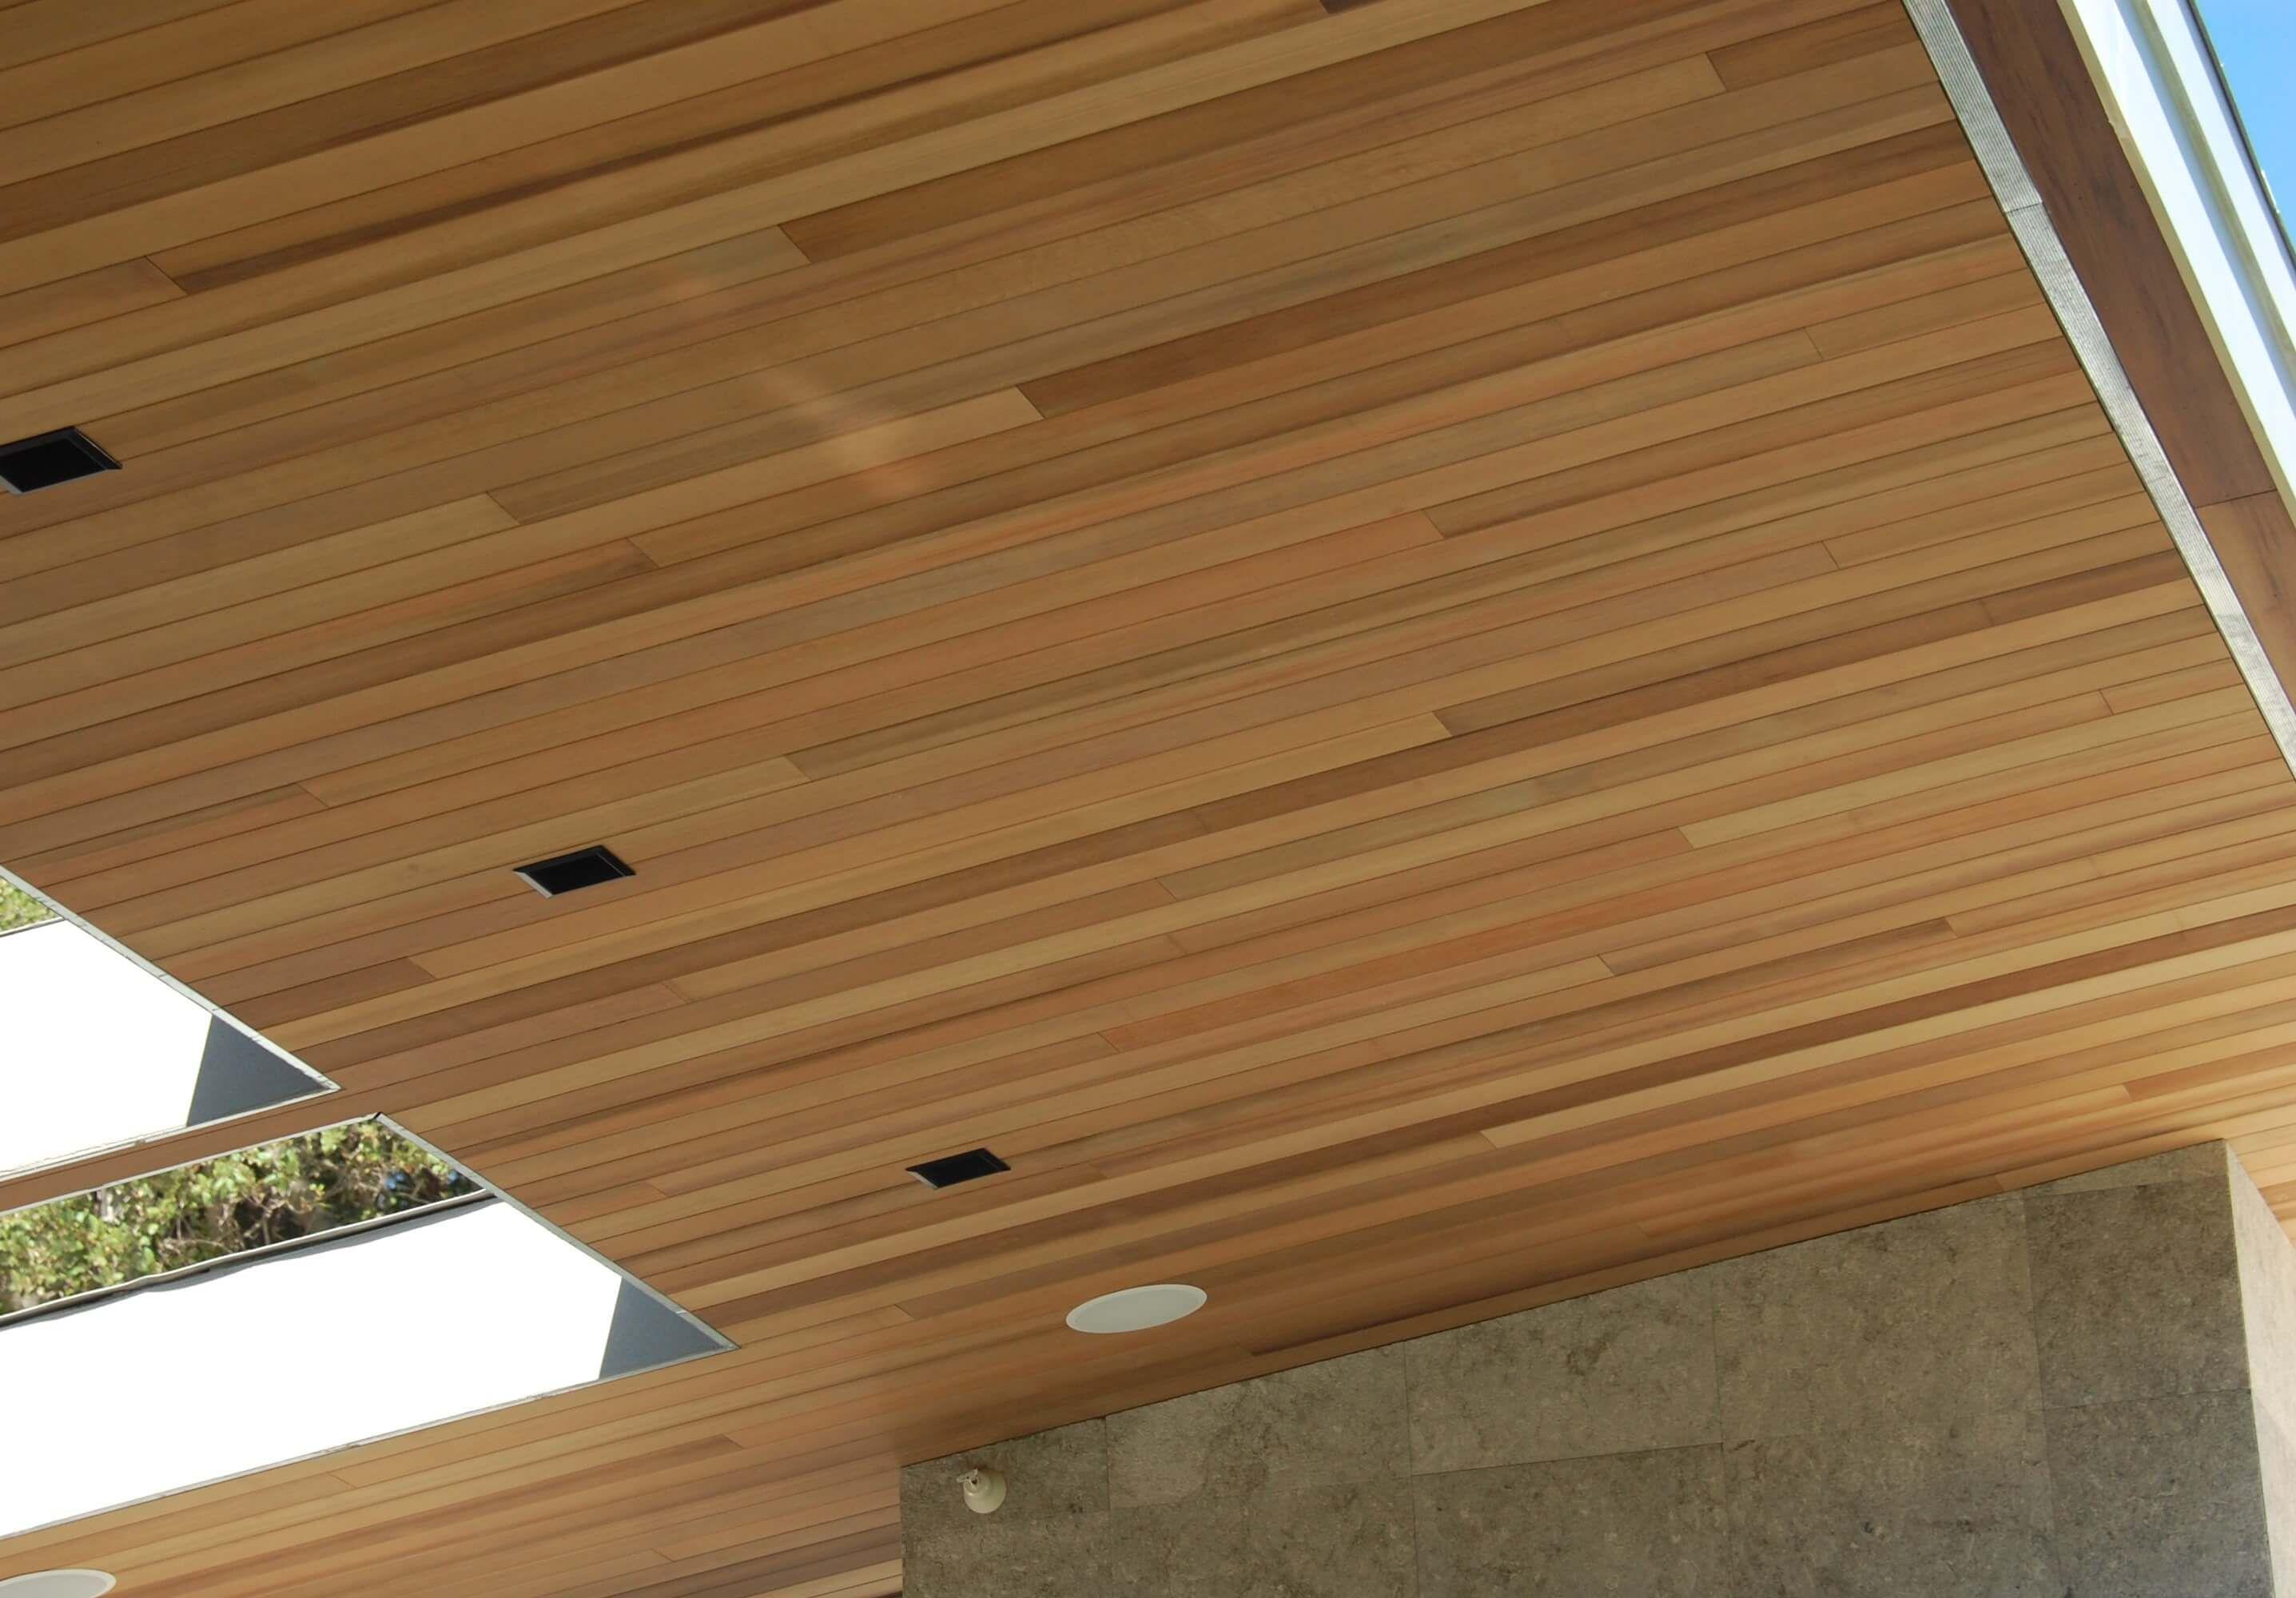 Photo Gallery Cedar Valley Manufacturing Cedar Shingle Siding Cedar Siding Panels Cedar Shingles Ceda Cedar Shingle Siding Shingle Siding Cedar Shingles